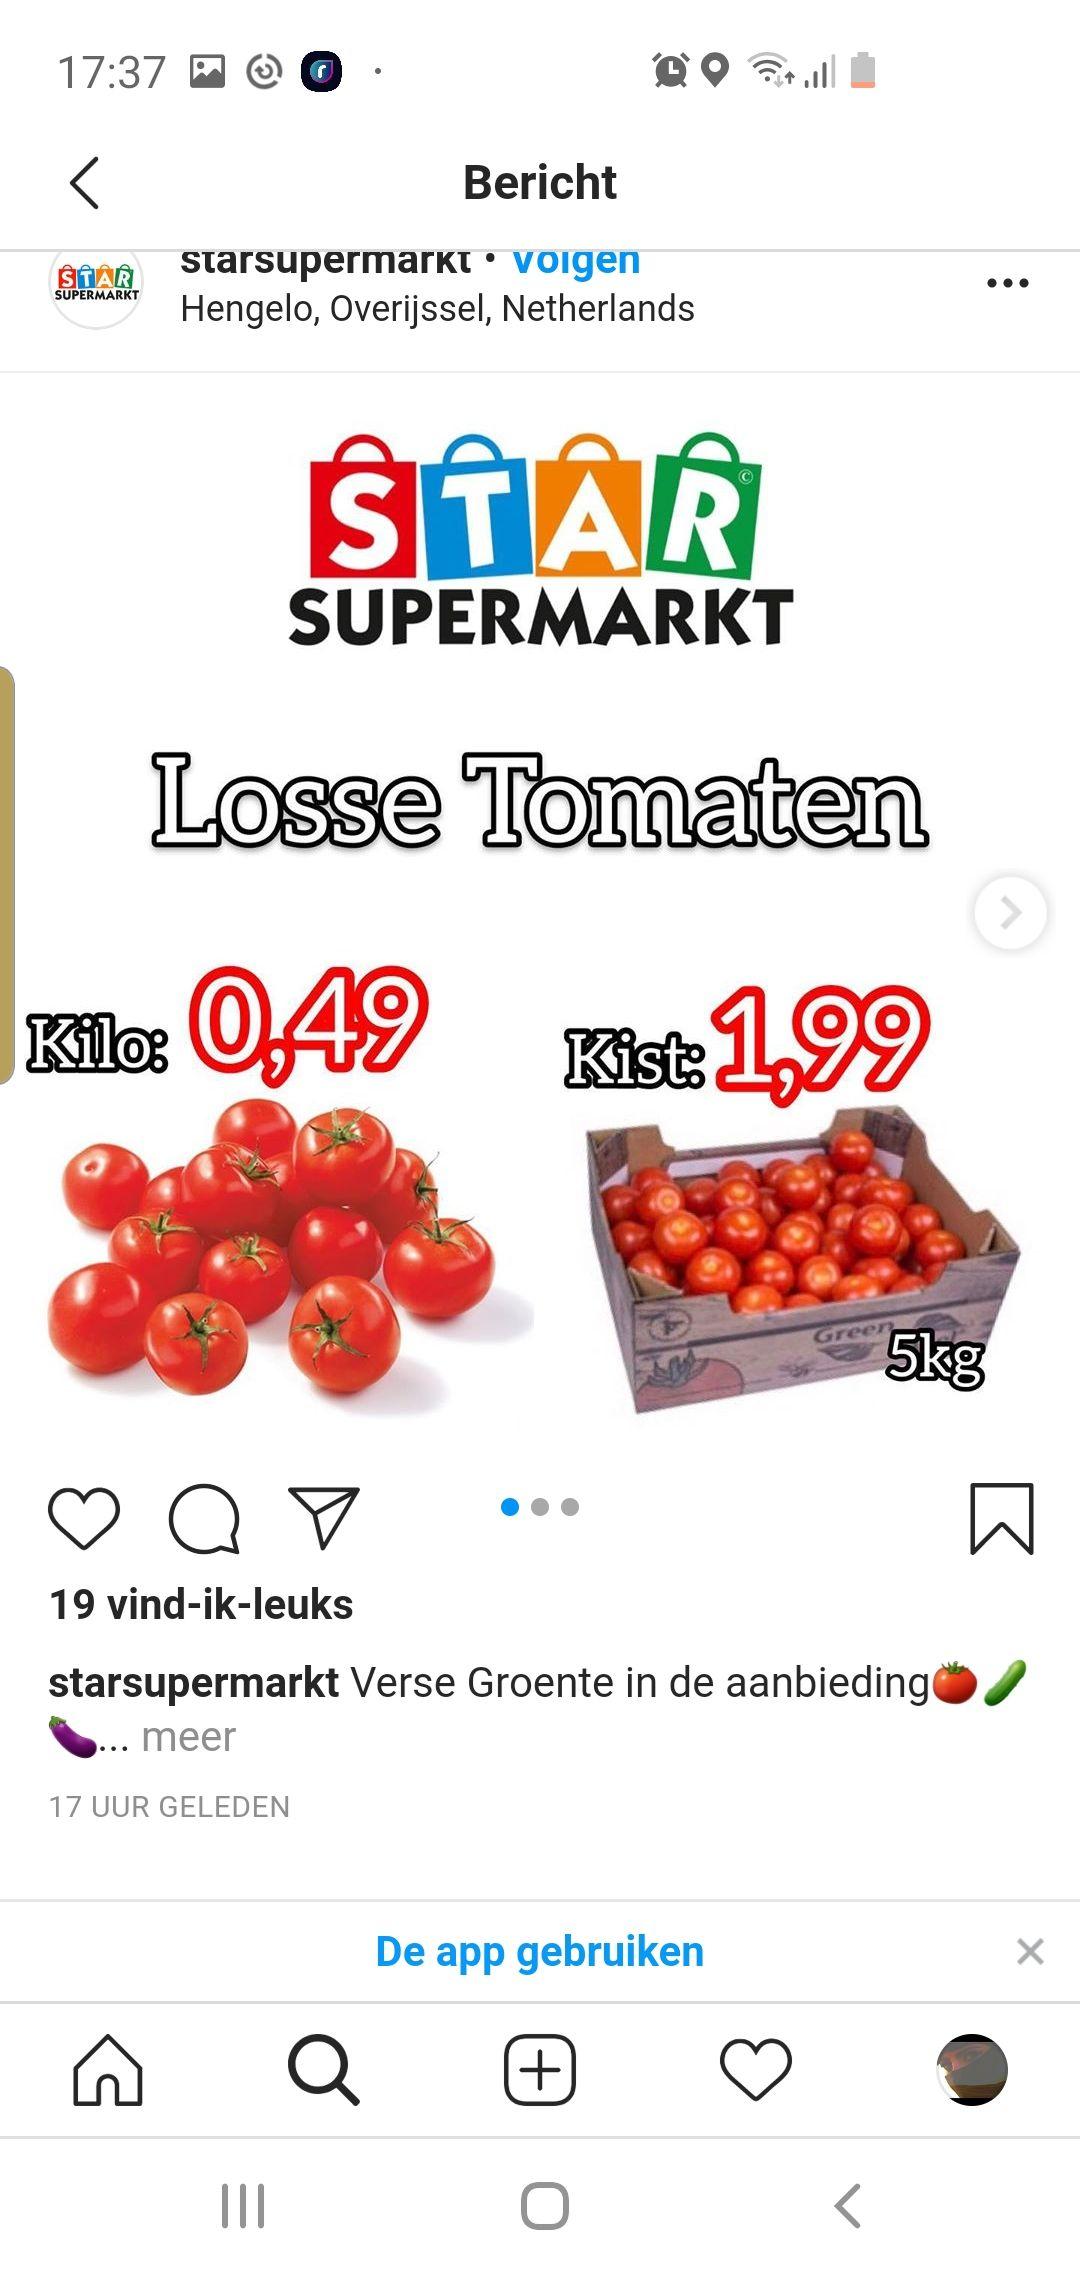 Kist tomaten 5 kilo 1.99 hengelo star supermarkt